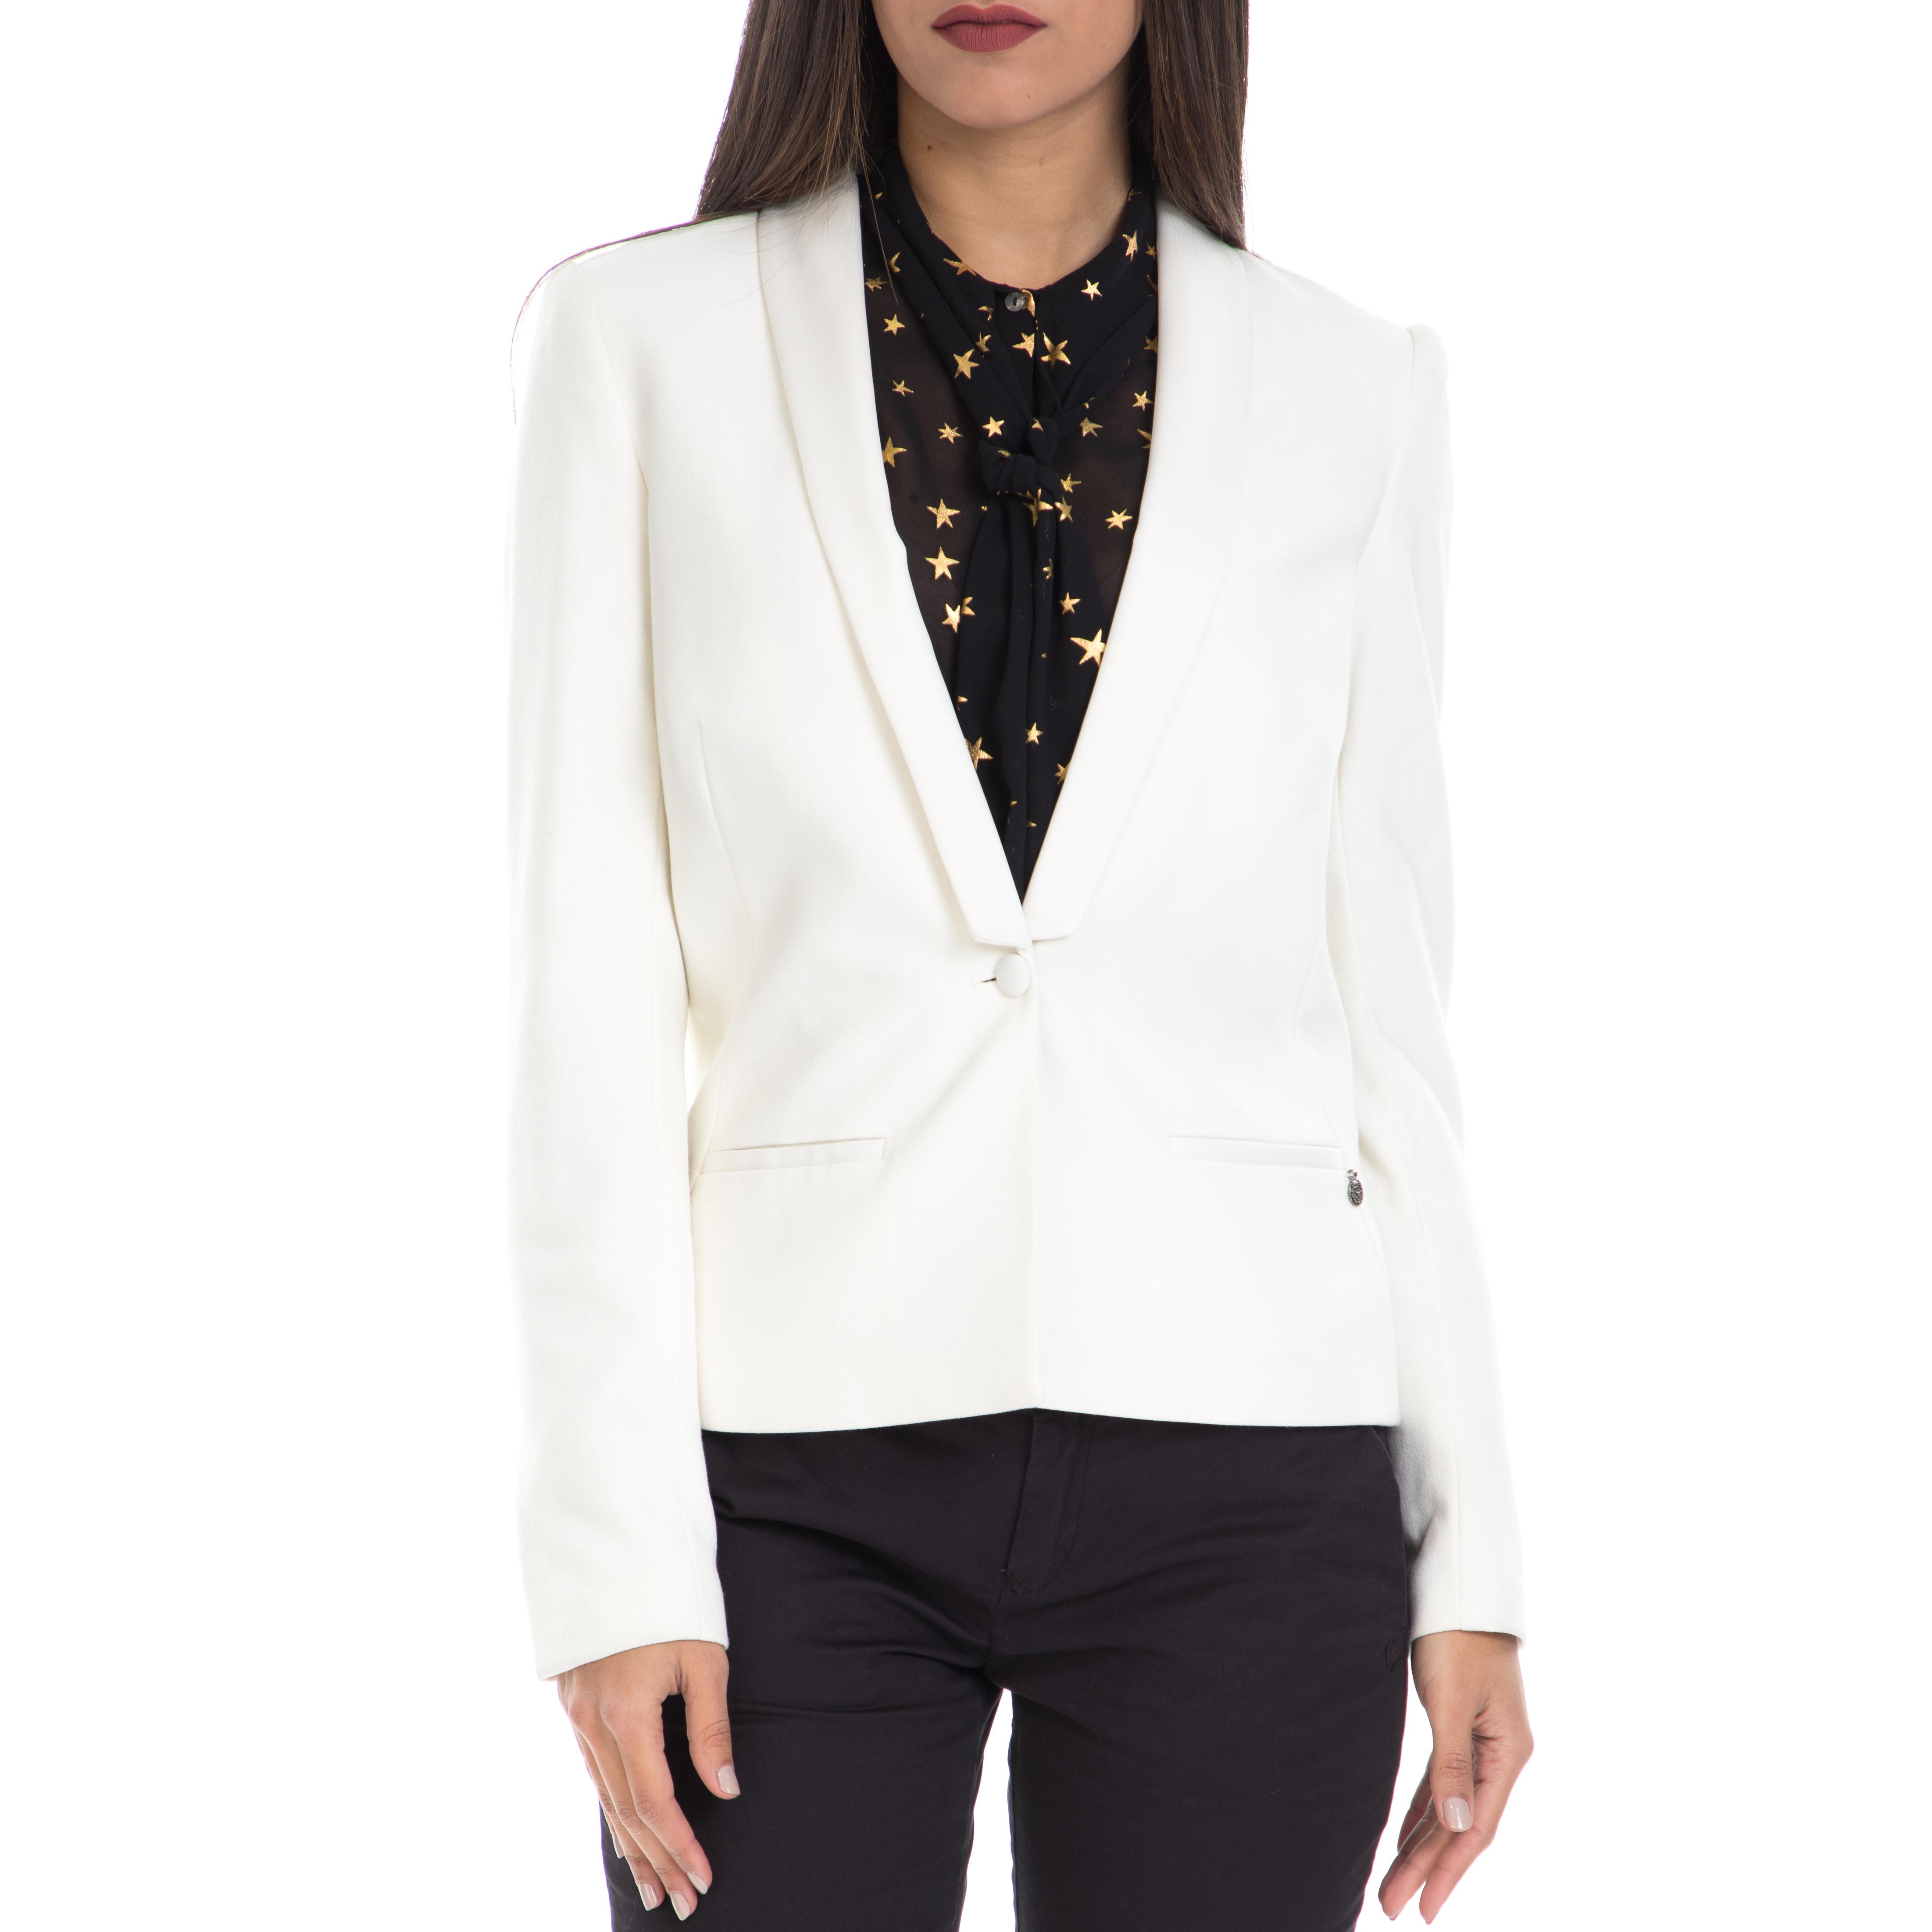 MAISON SCOTCH – Γυναικείο σακάκι MAISON SCOTCH λευκό